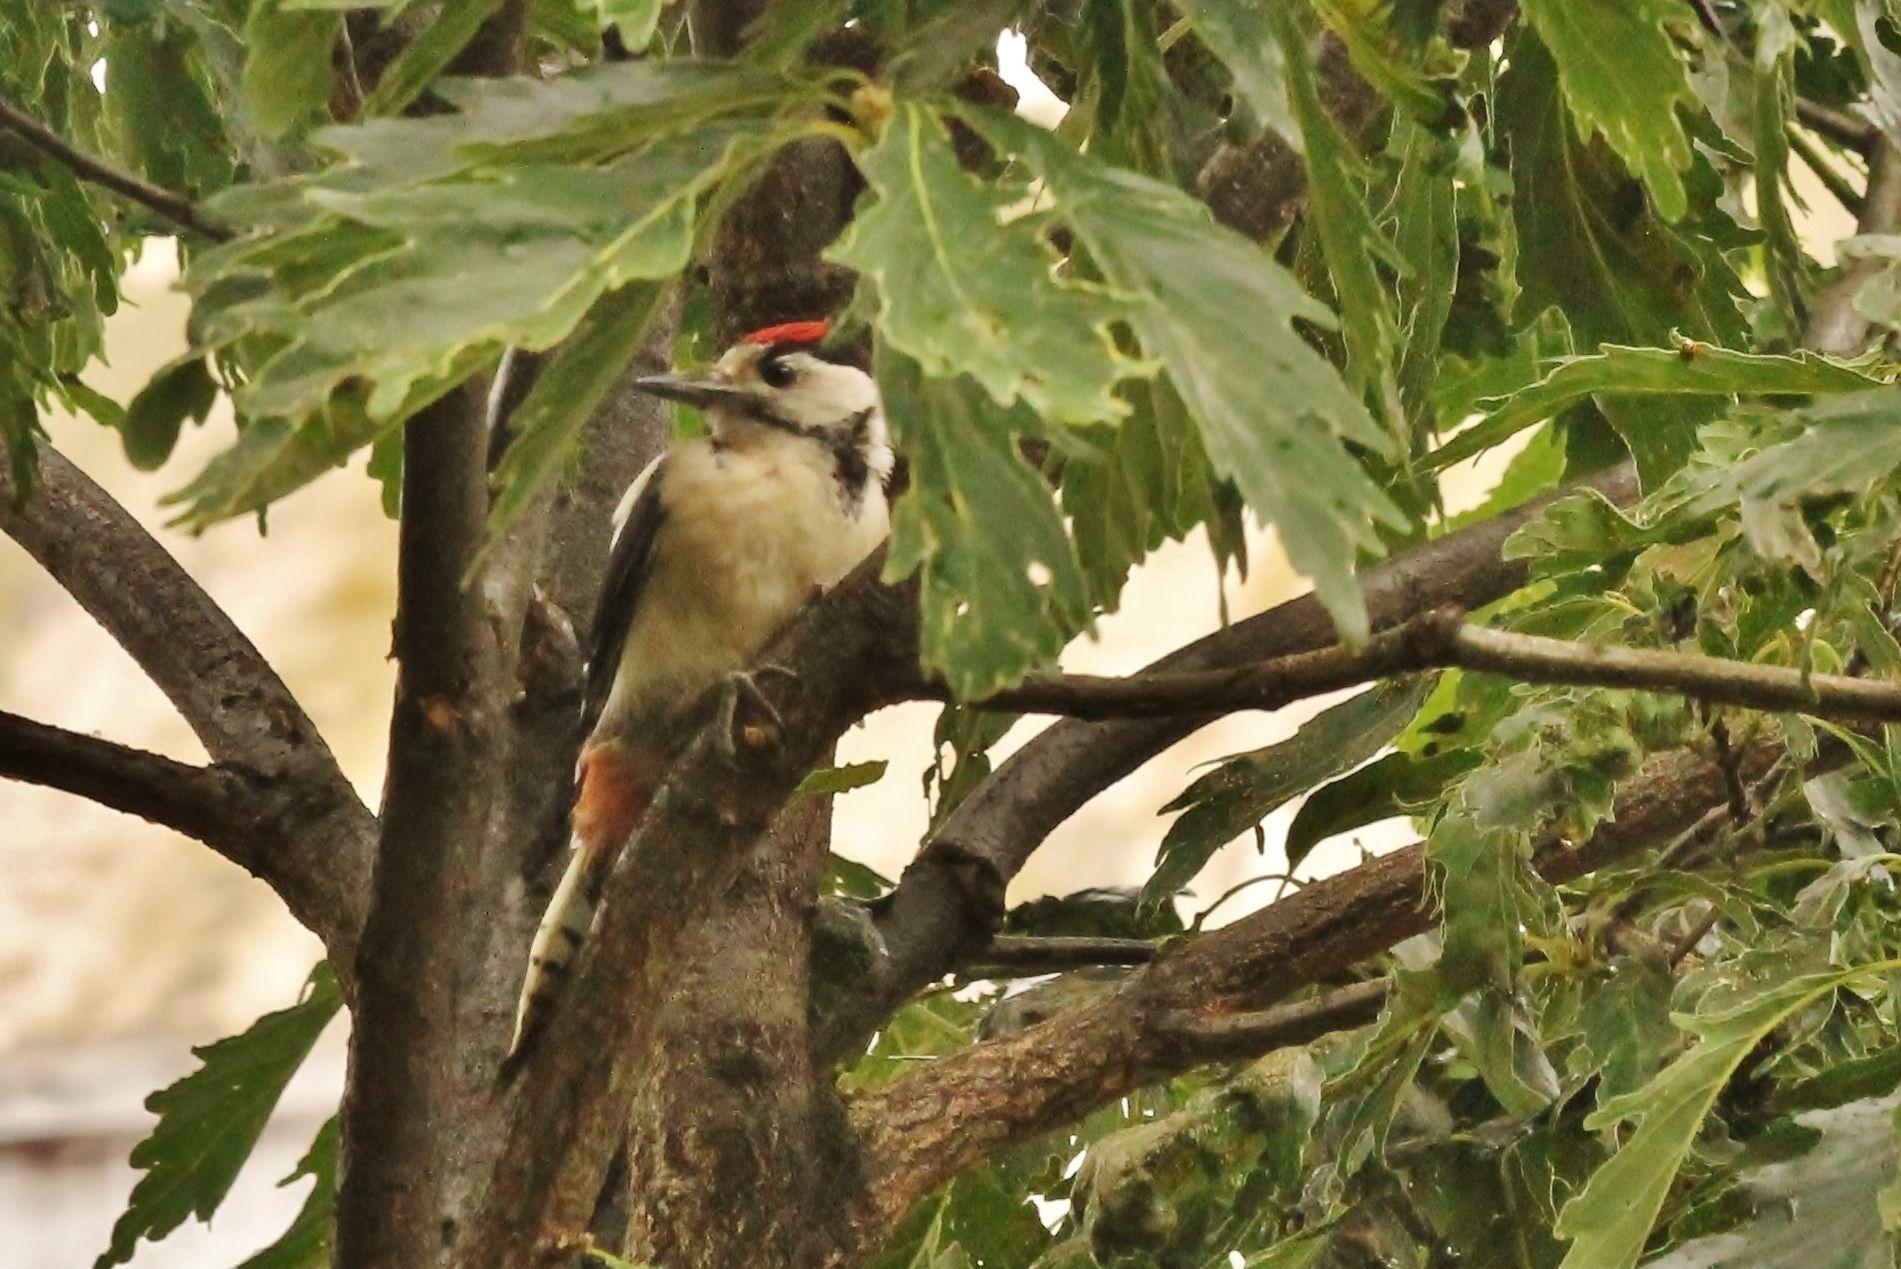 Great spotted woodpecker  #Buntspecht #Great_spotted_woodpecker #Austria #birdwatching #vogelbeobachtung #